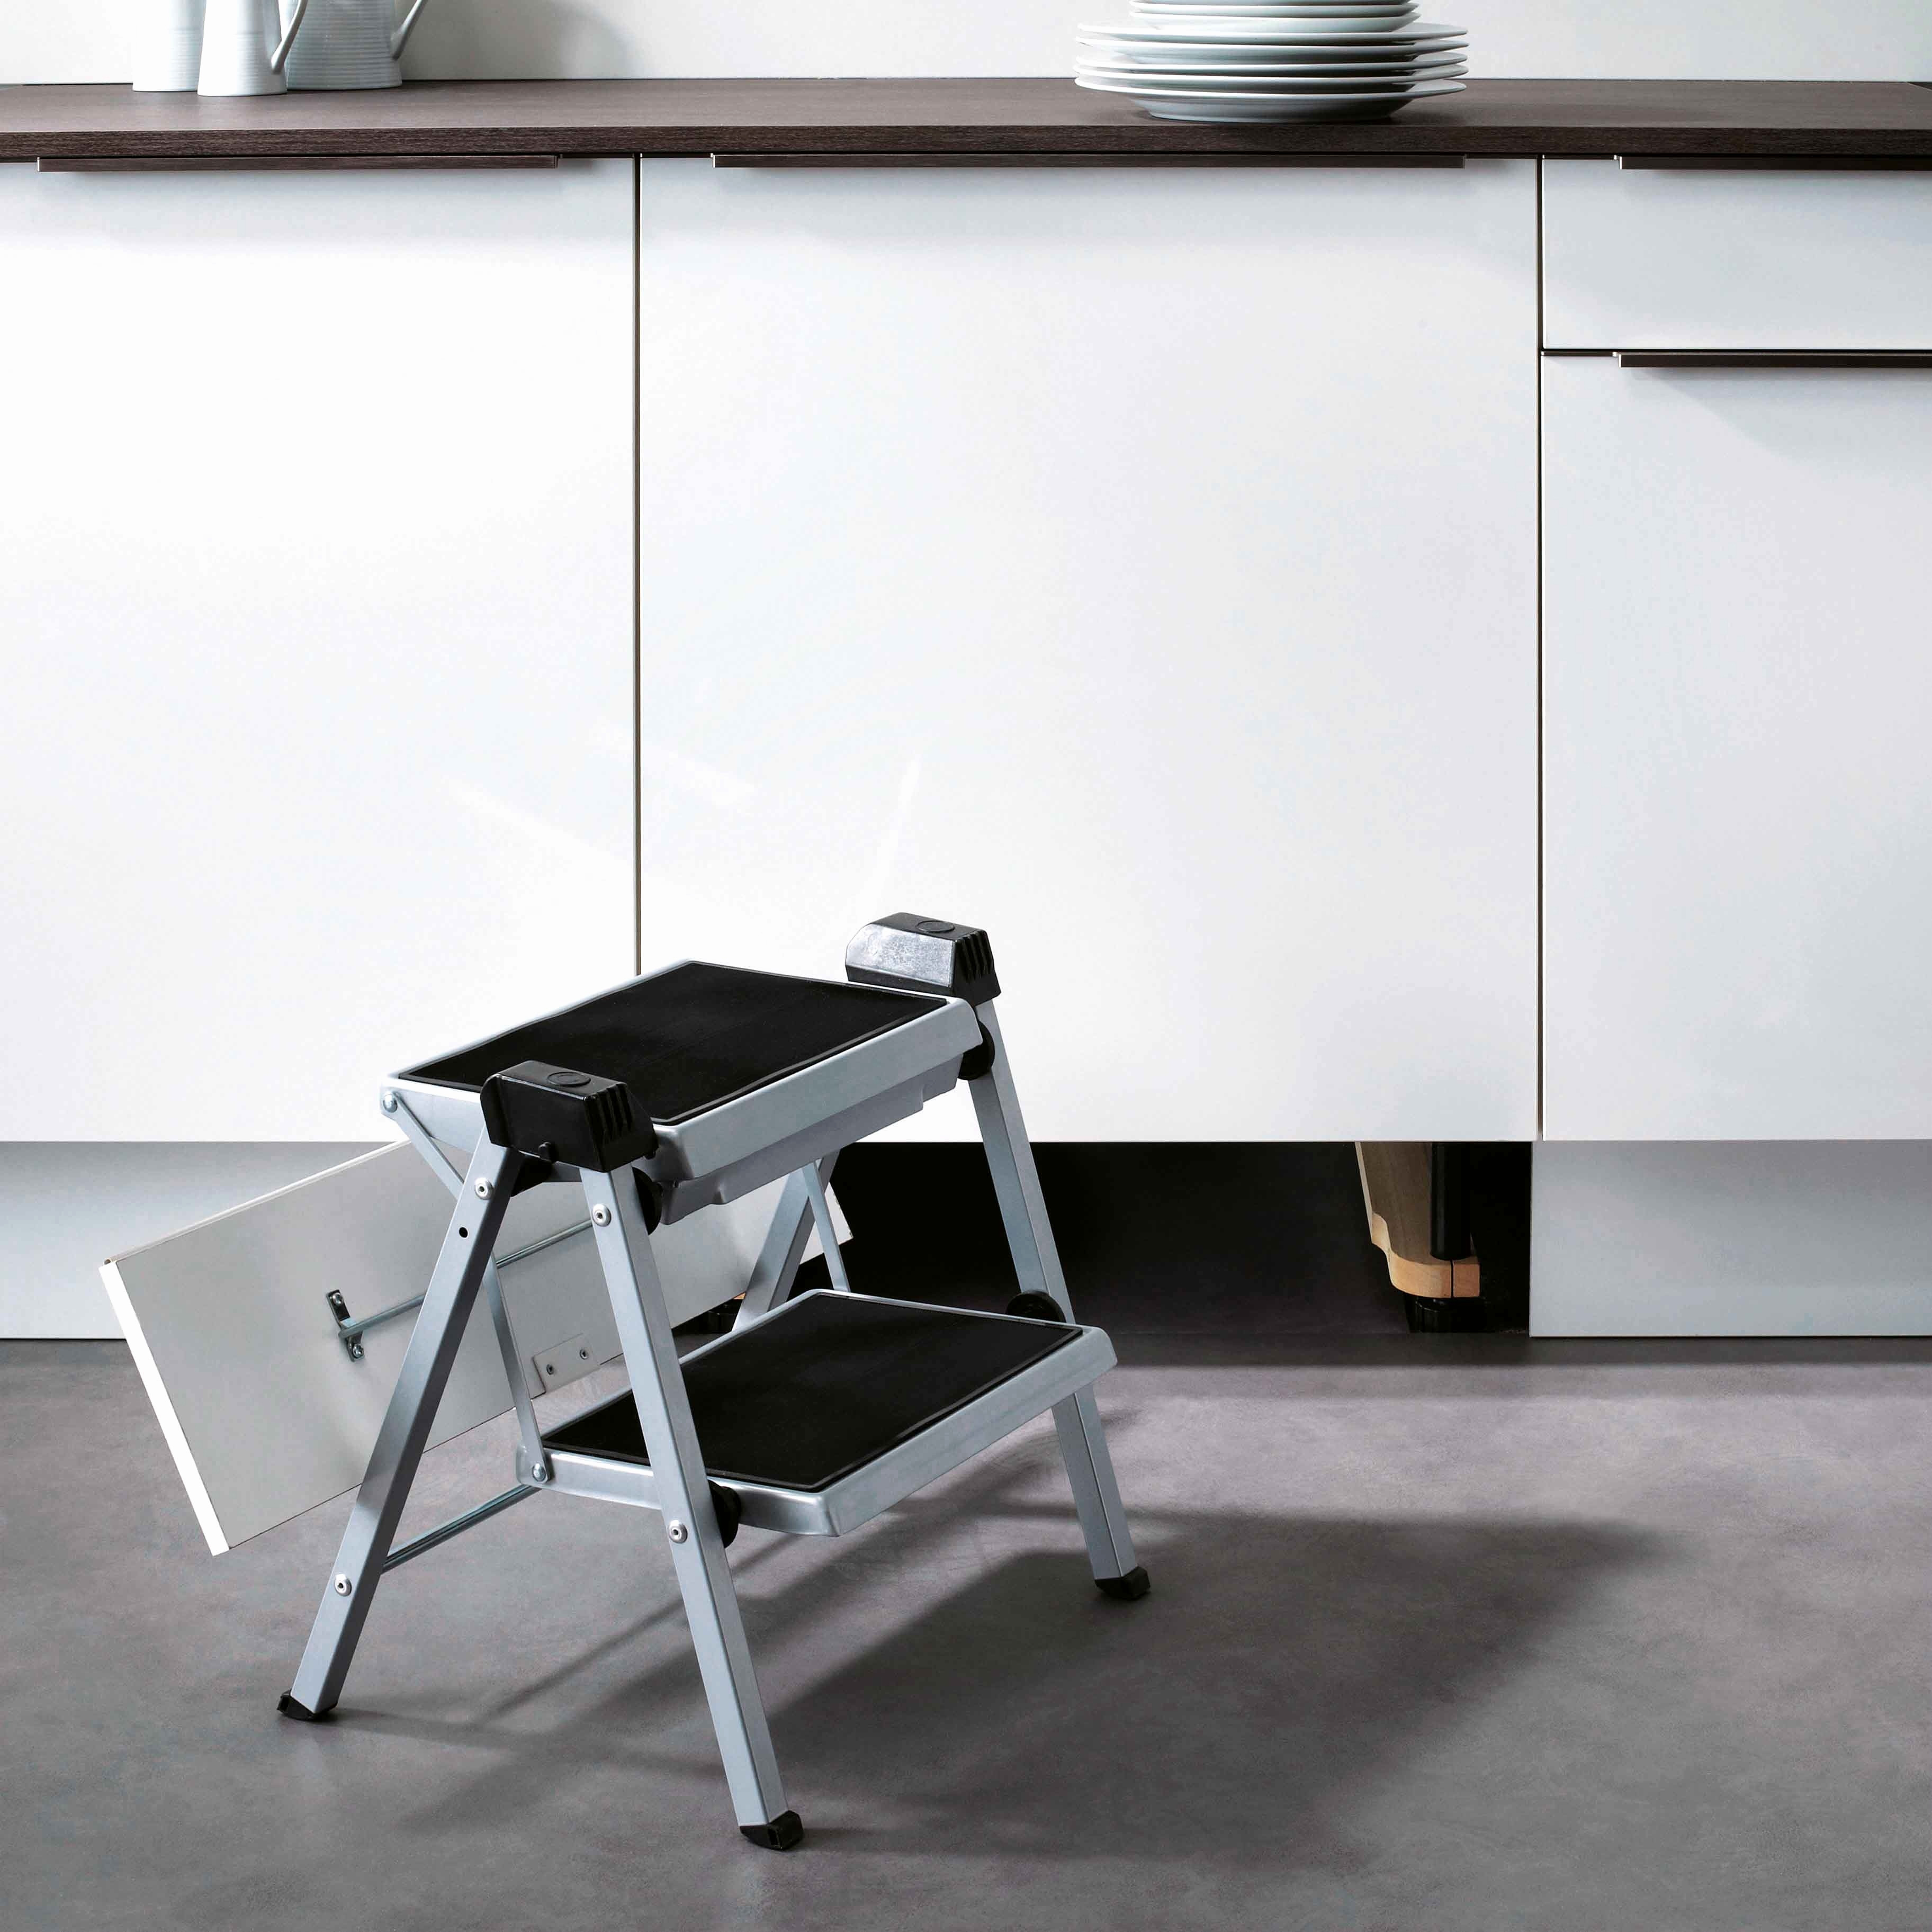 fauteuil resine tressee castorama. Black Bedroom Furniture Sets. Home Design Ideas